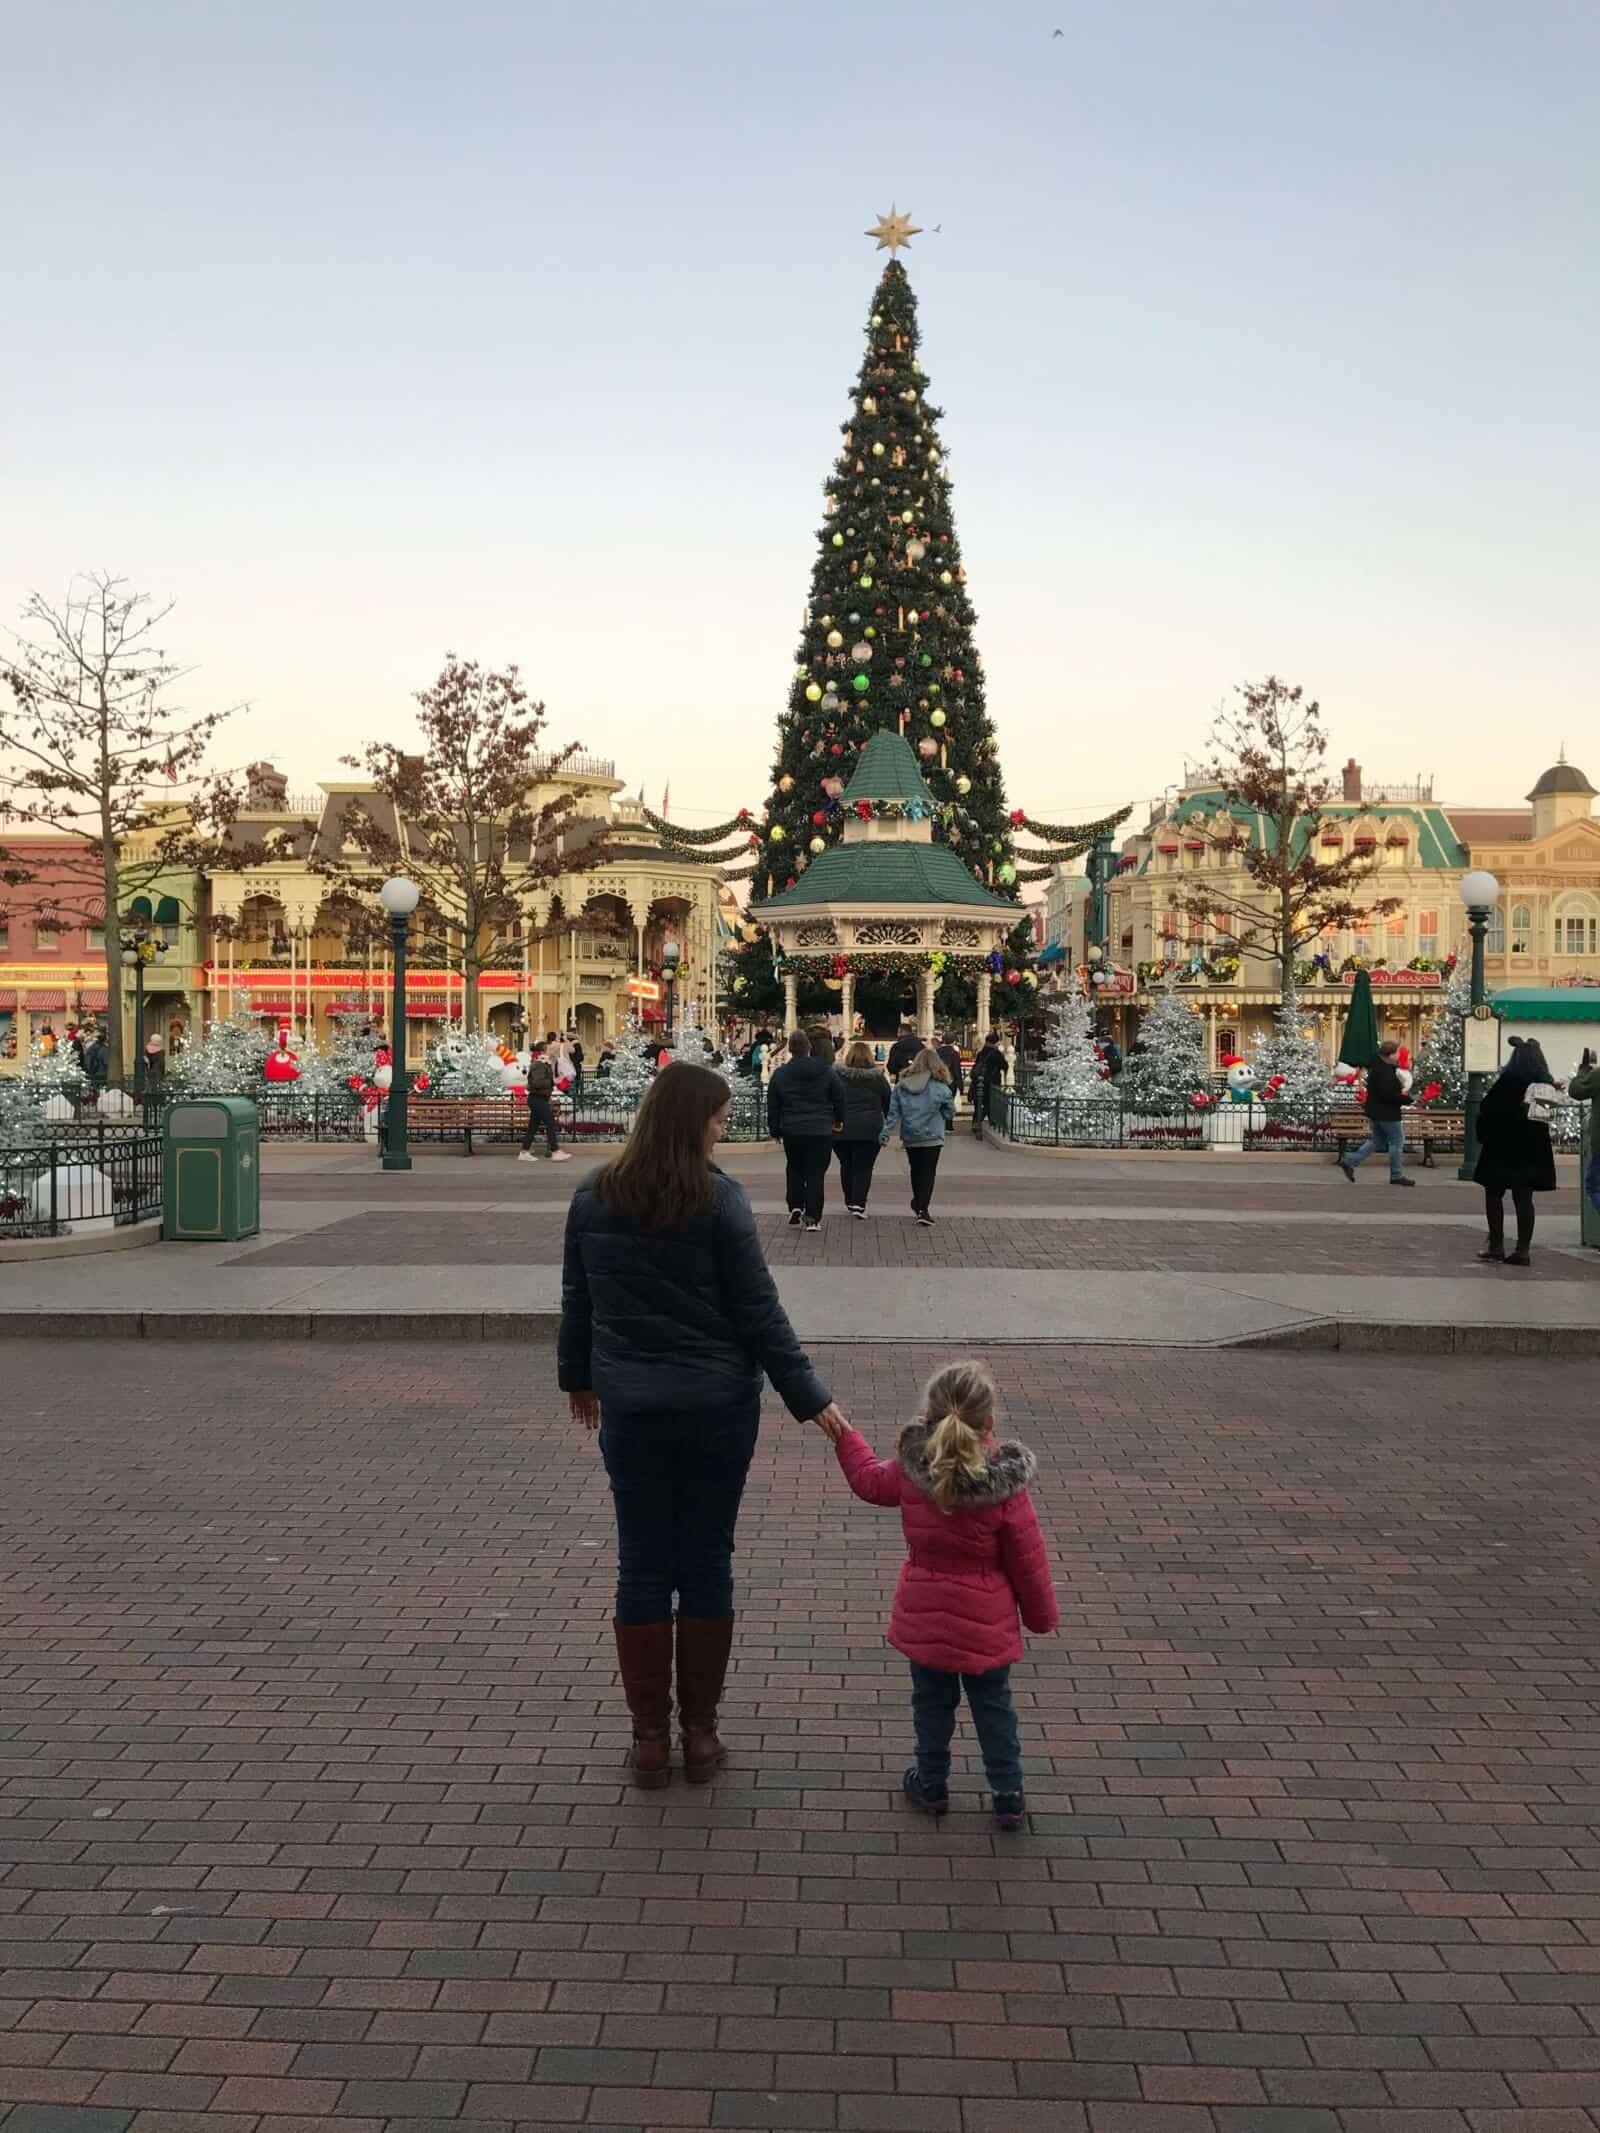 Visiting Disneyland Paris is December